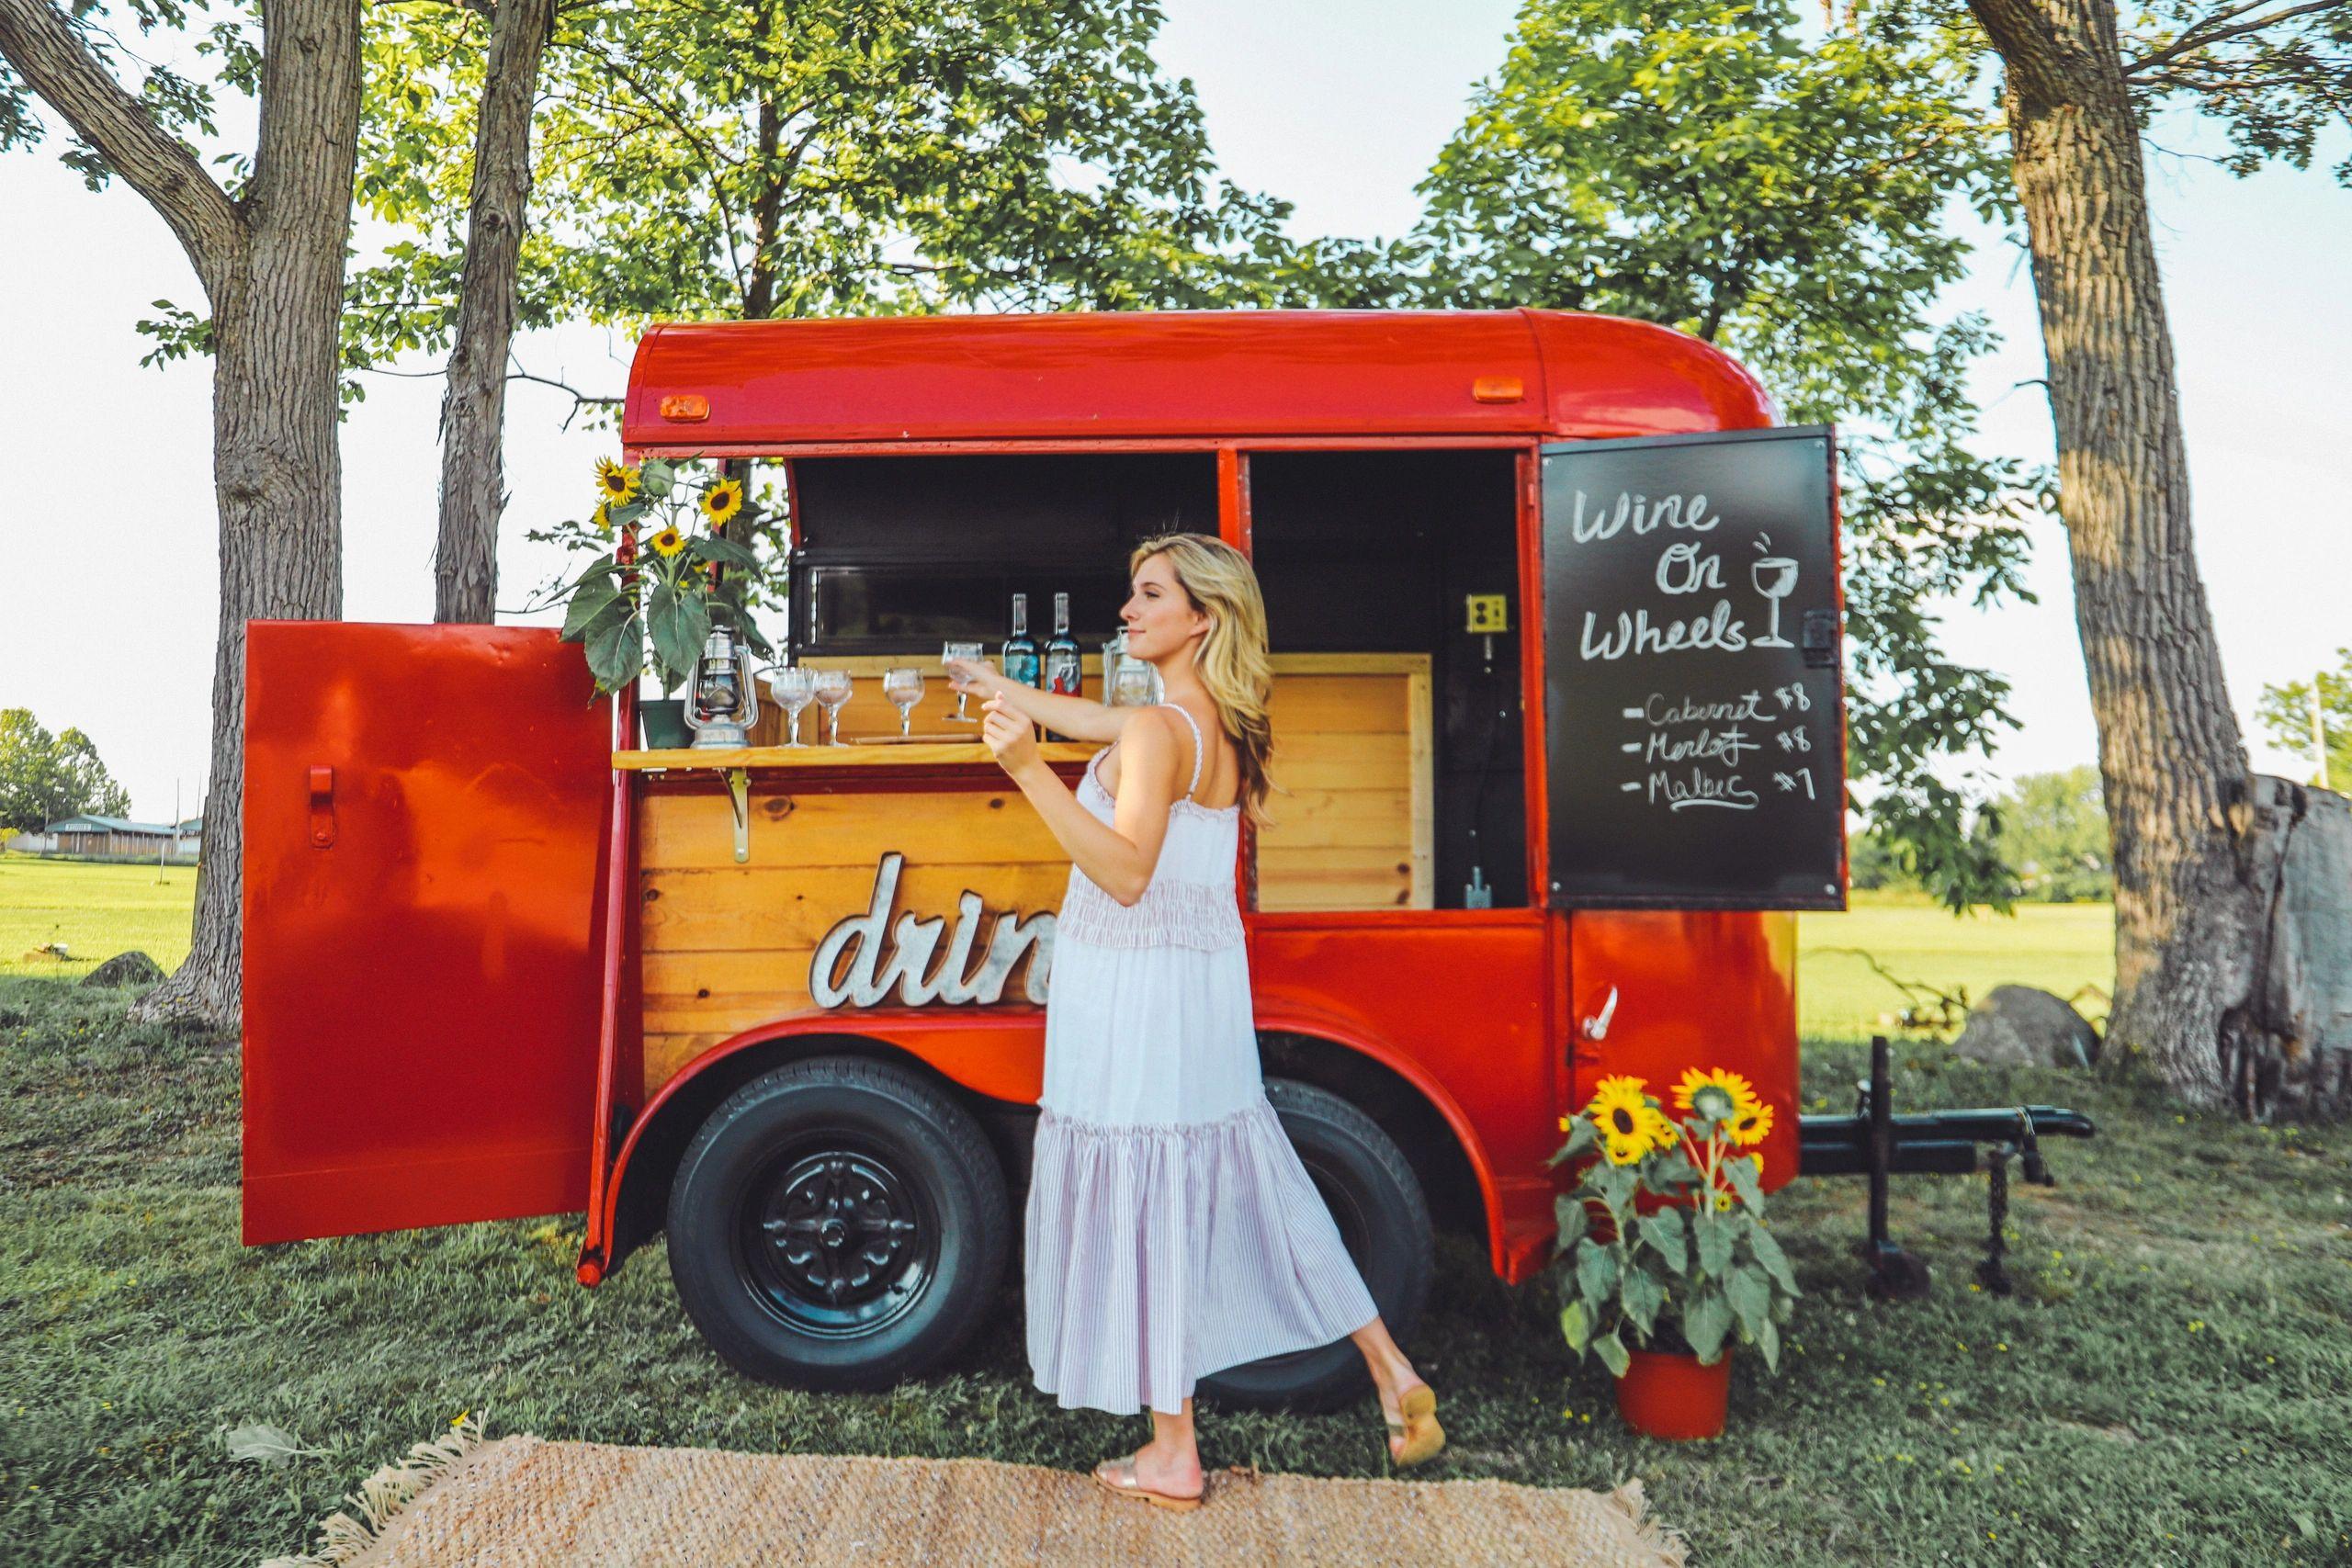 Campfire Trailers Horse Trailer Mobile Bar Mobile Bar Sales Campfire Trailers